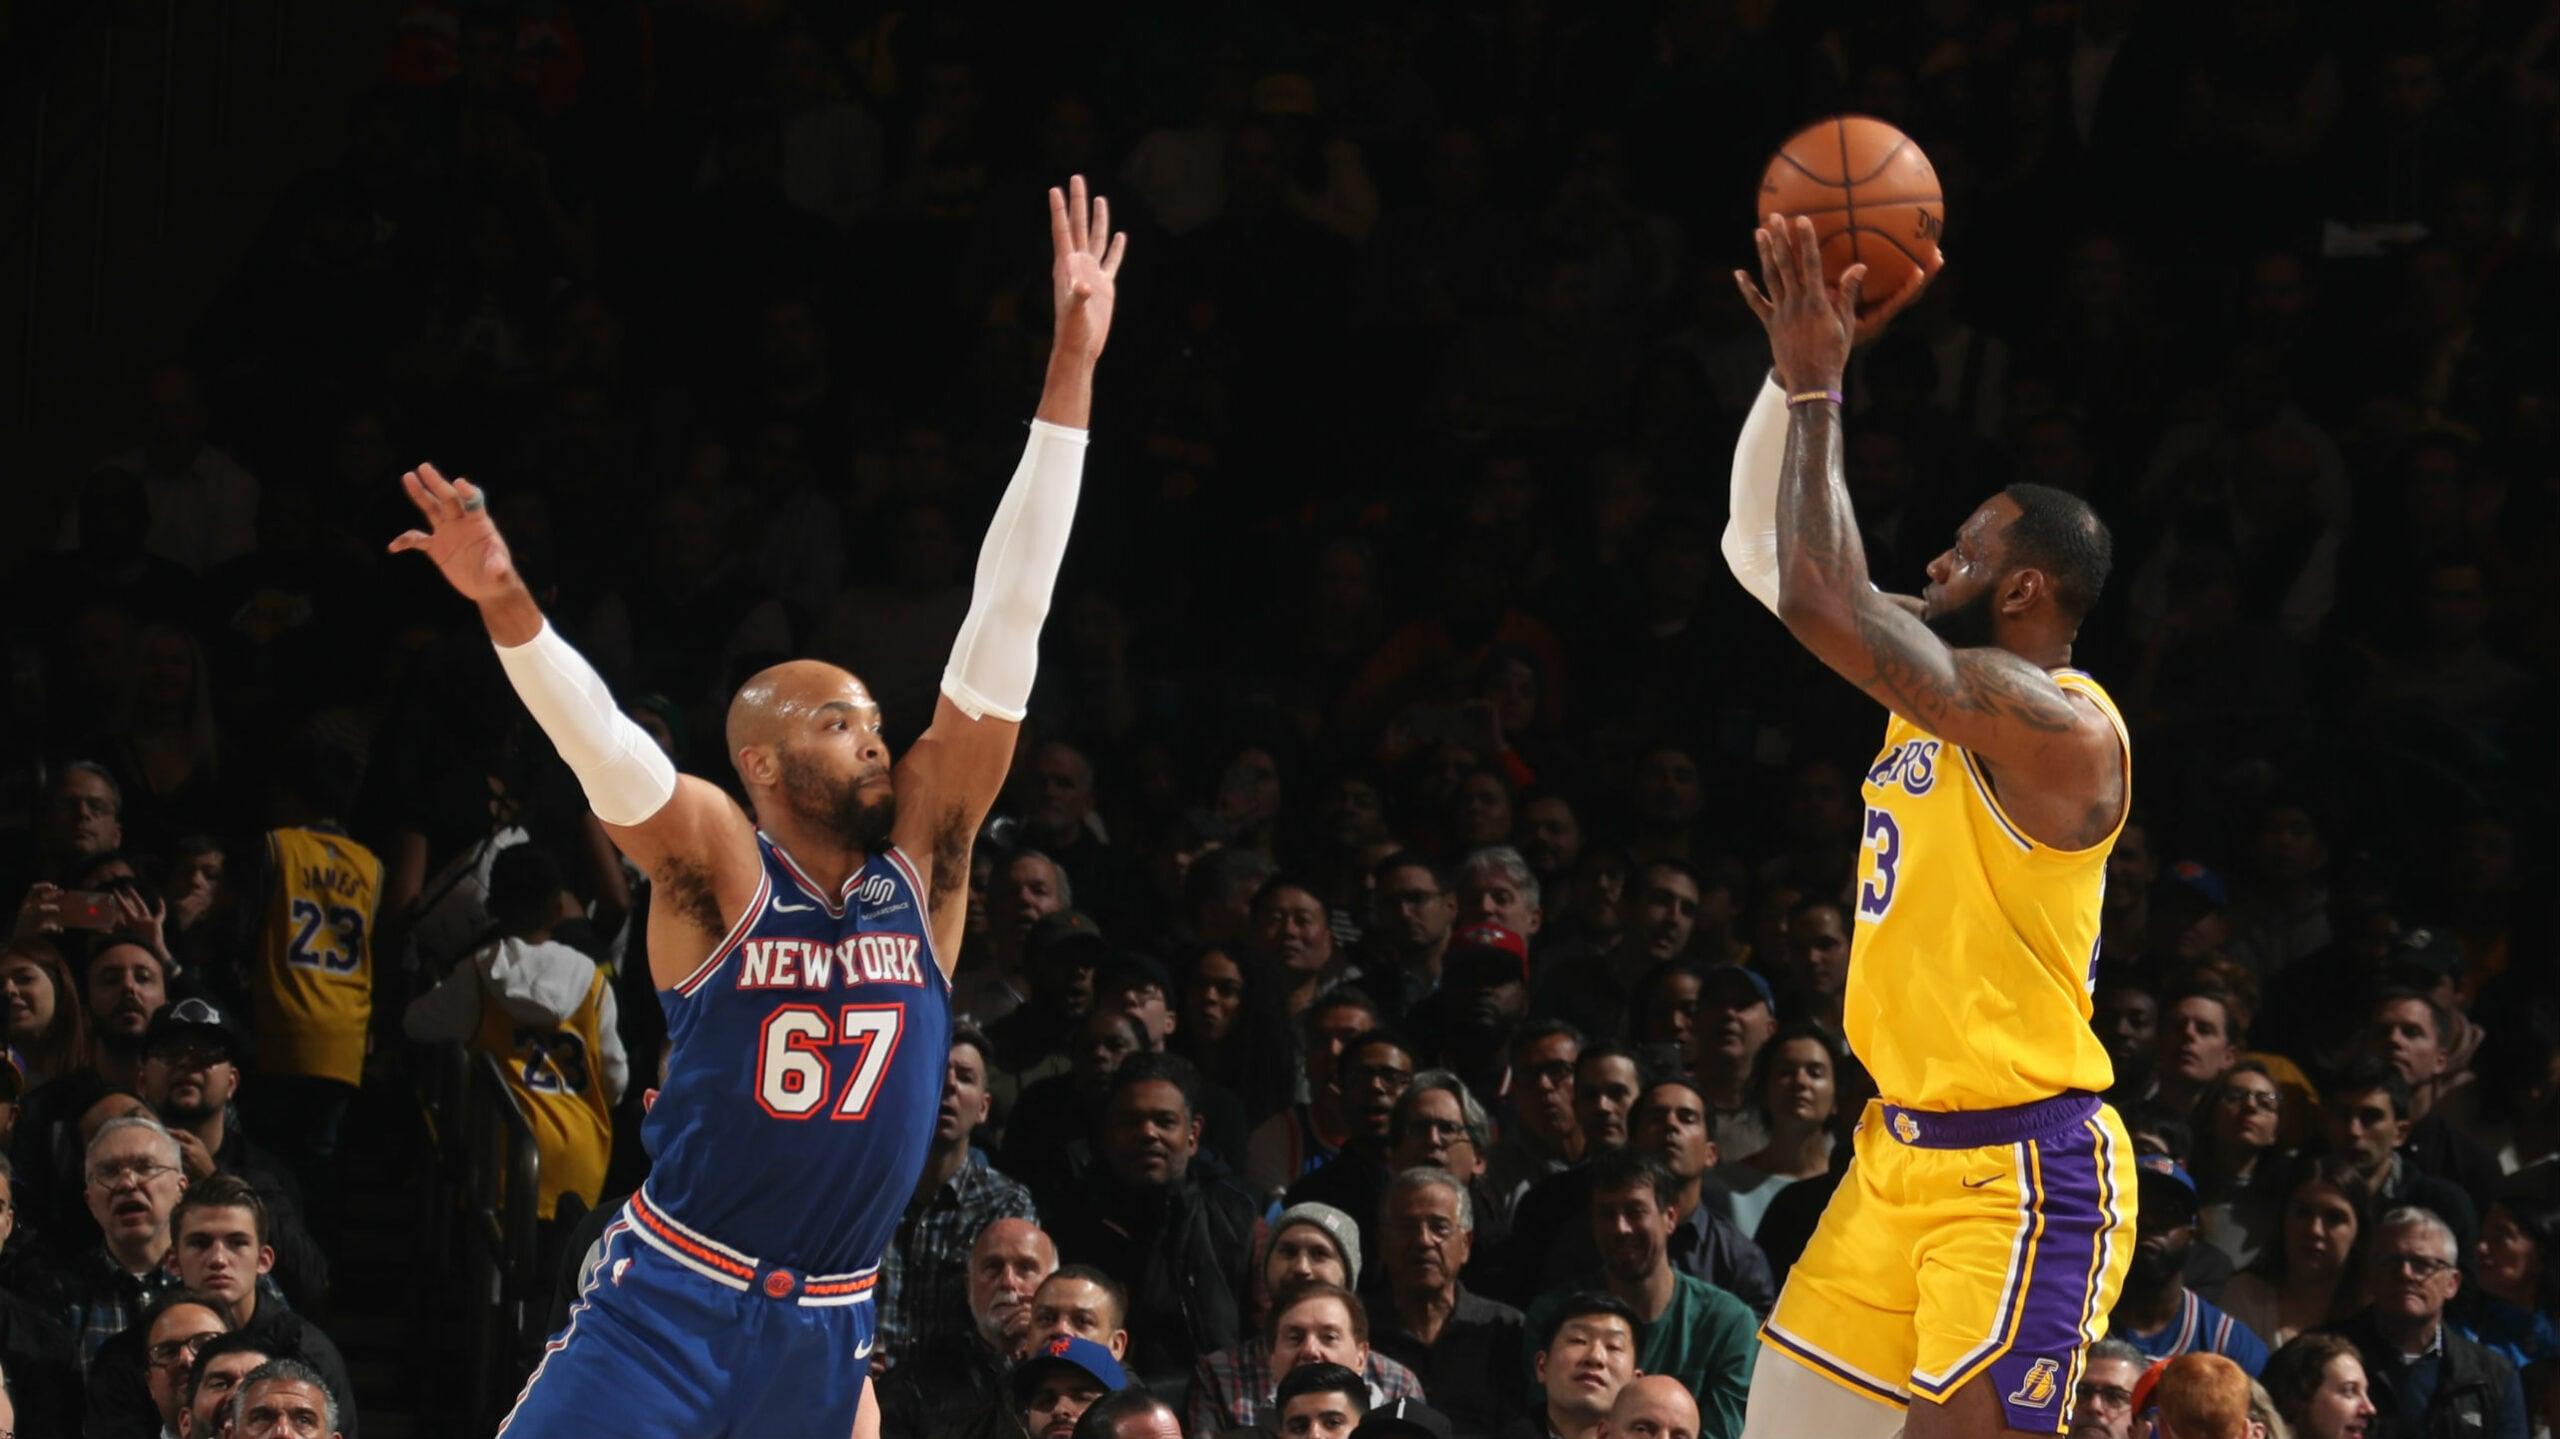 Lakers @ Knicks